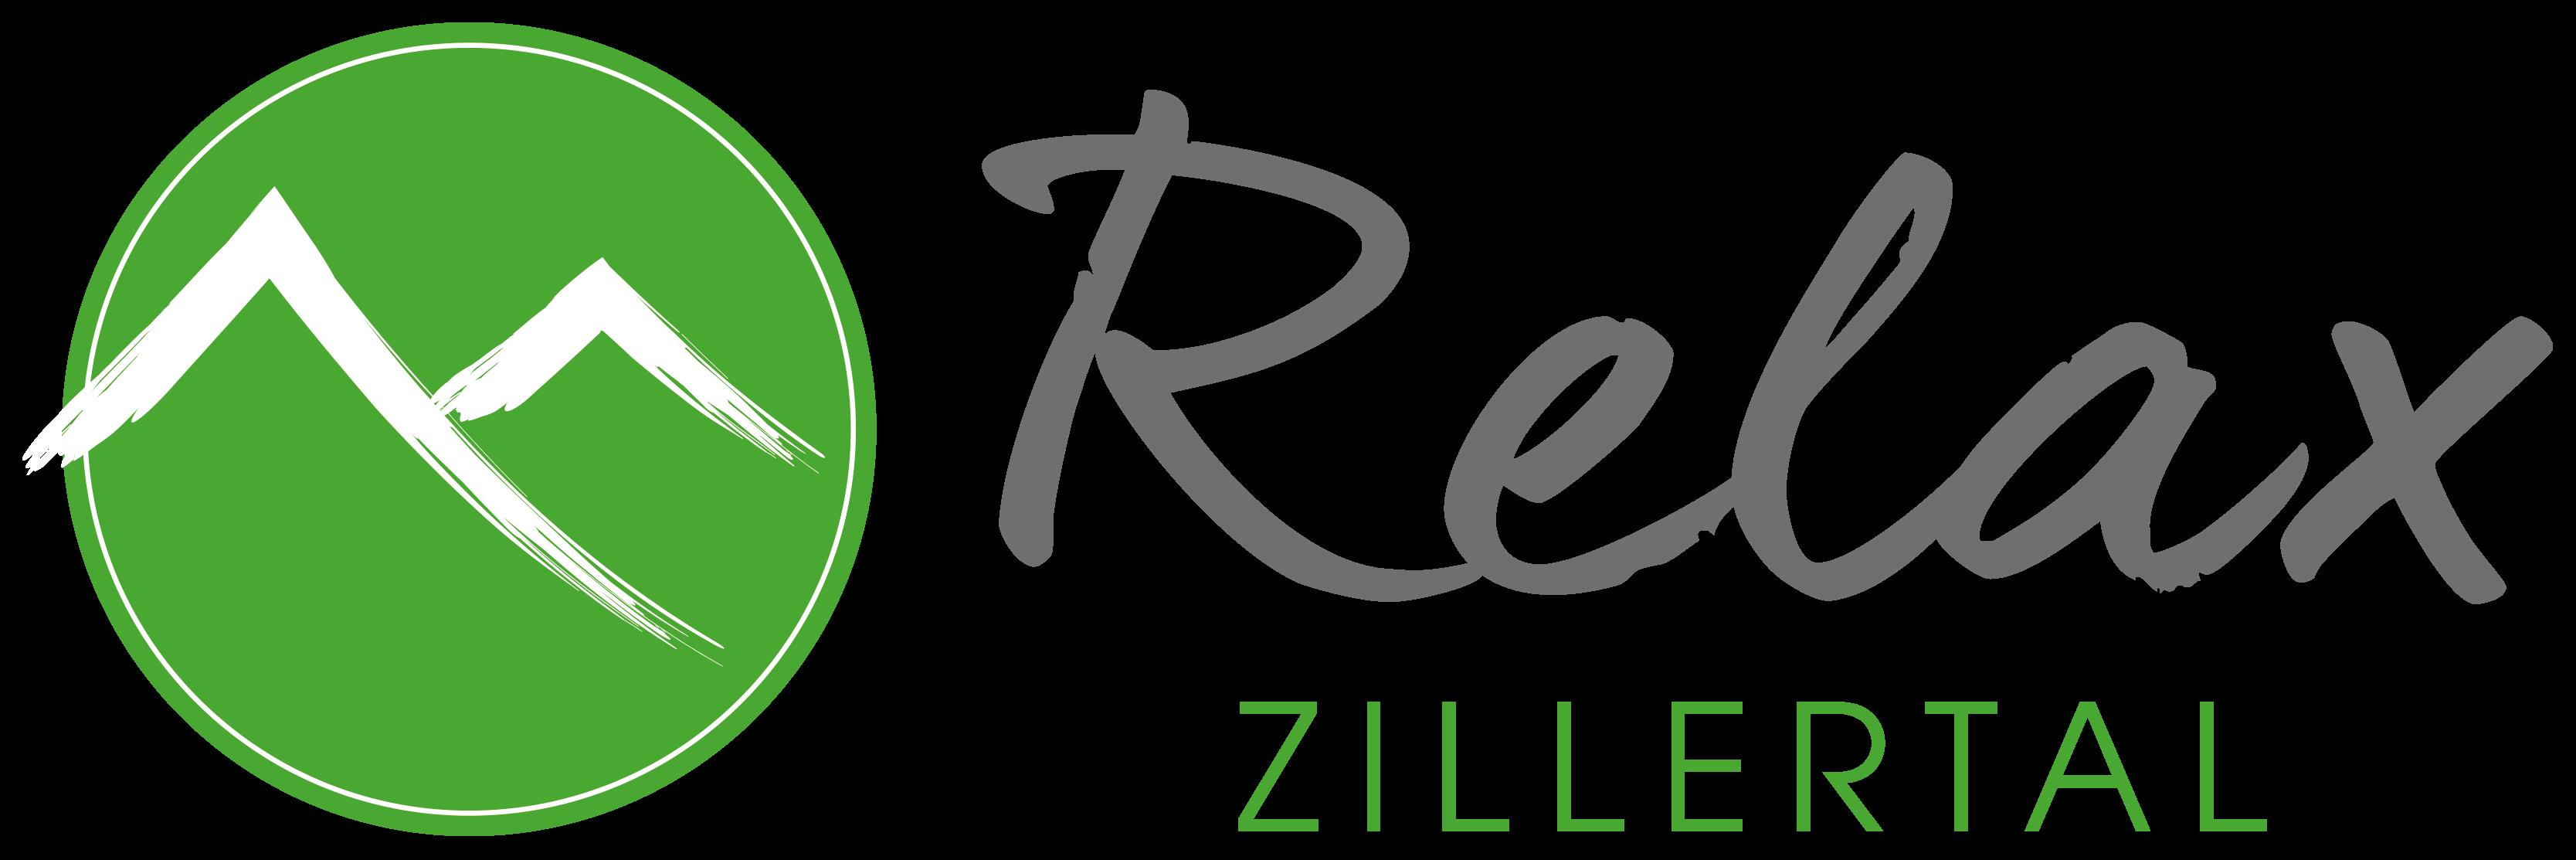 RELAX ZILLERTAL | UNTERKÜNFTE IM ZILLERTAL